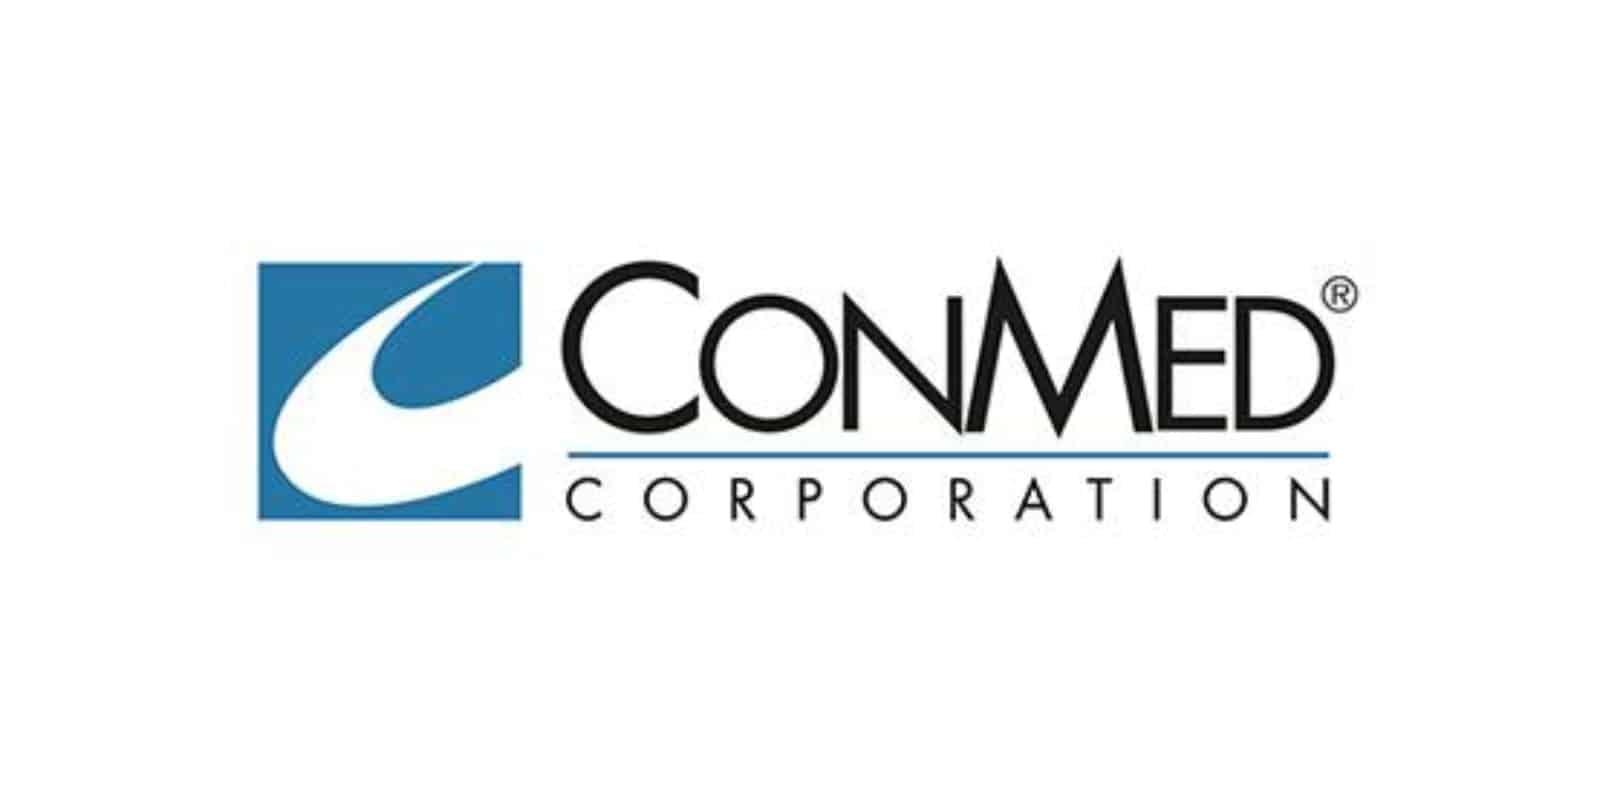 https://arriaza.es/imagenes/conmed_logo.jpg